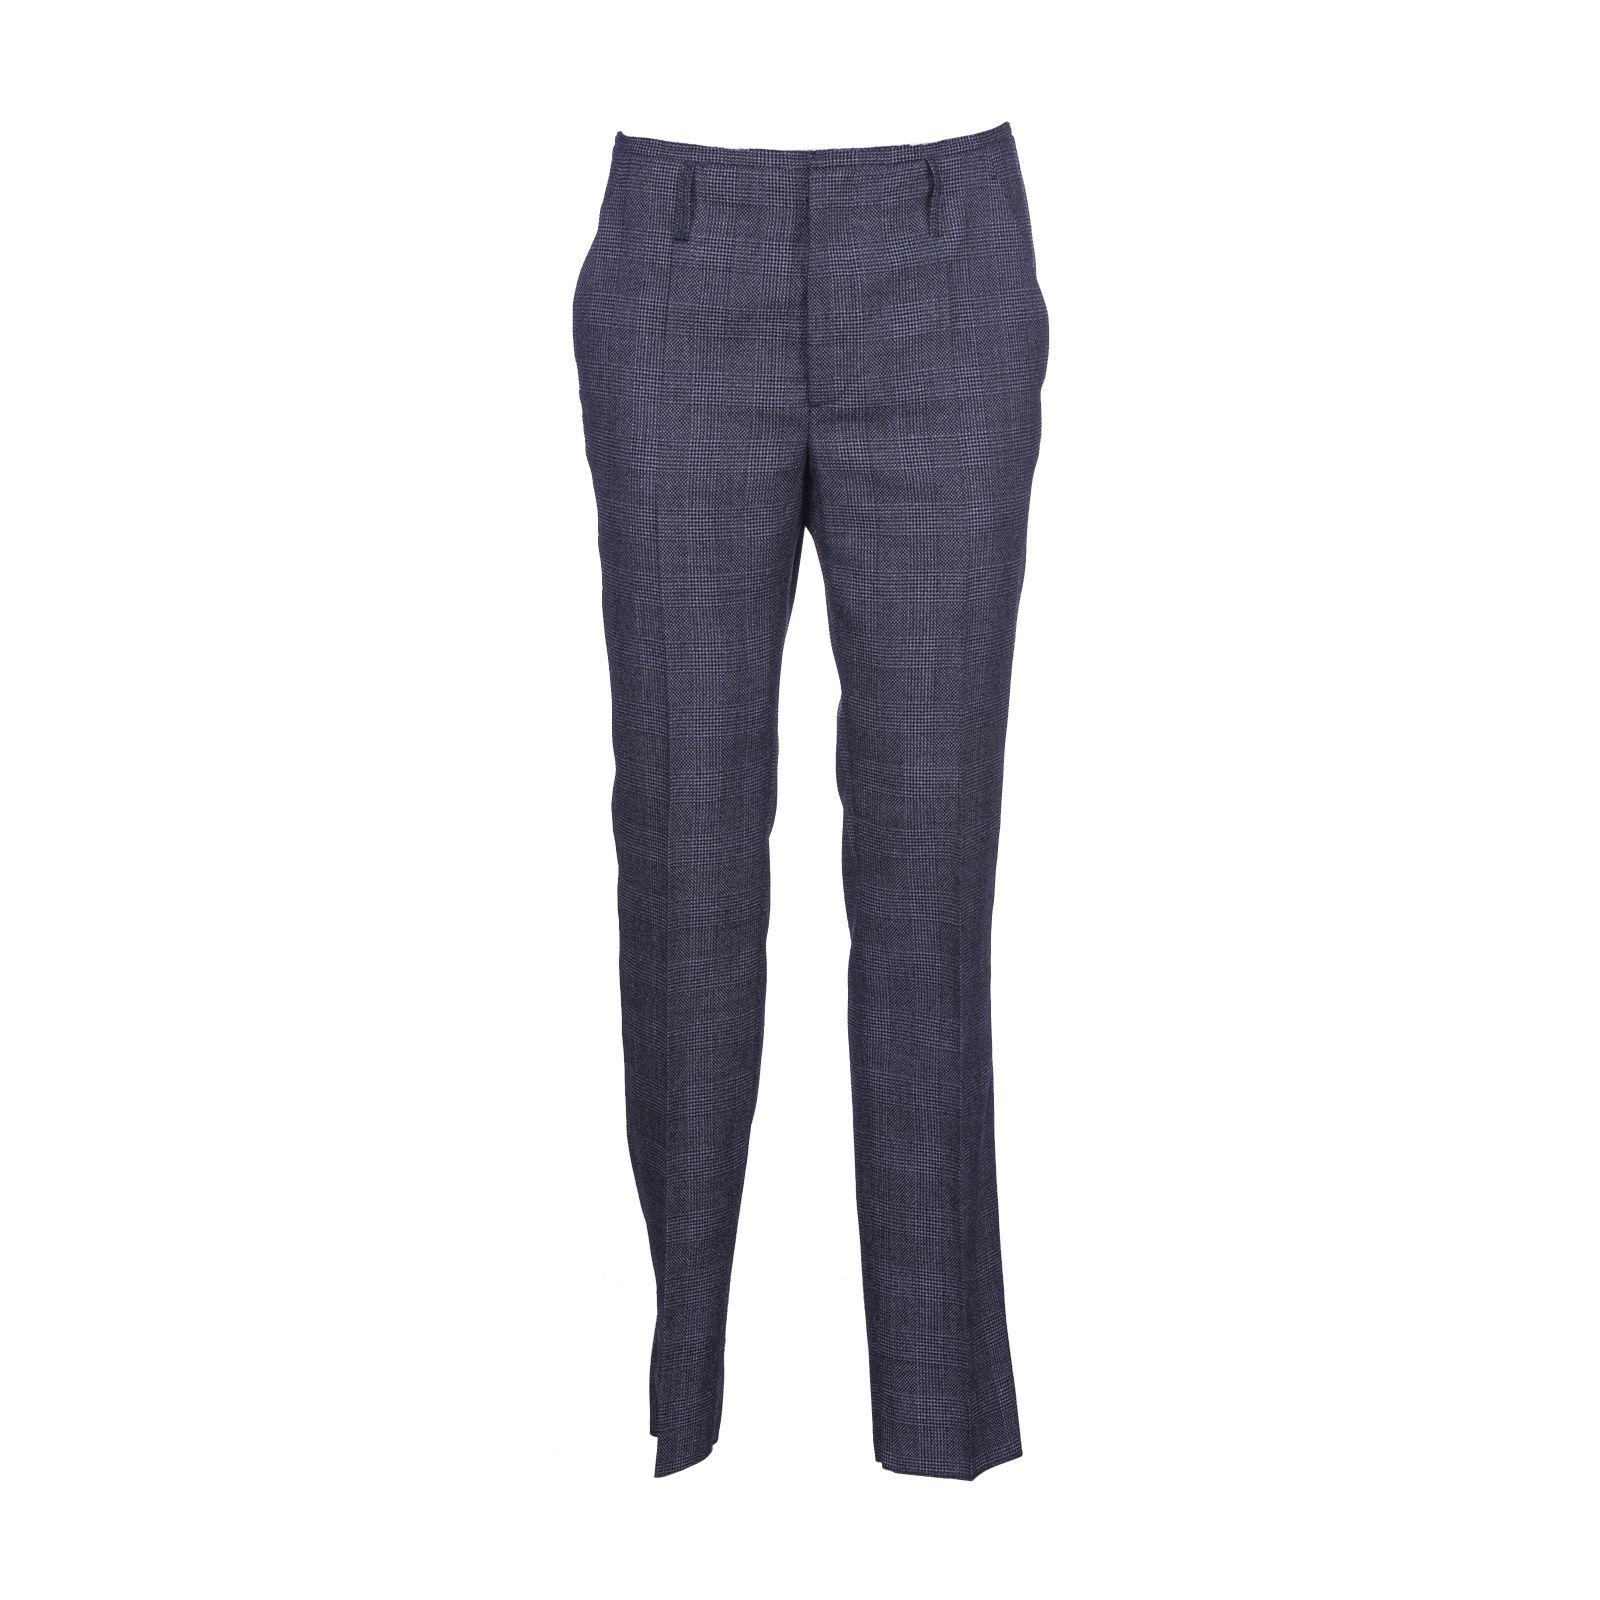 Martin Margiela Woven Trousers